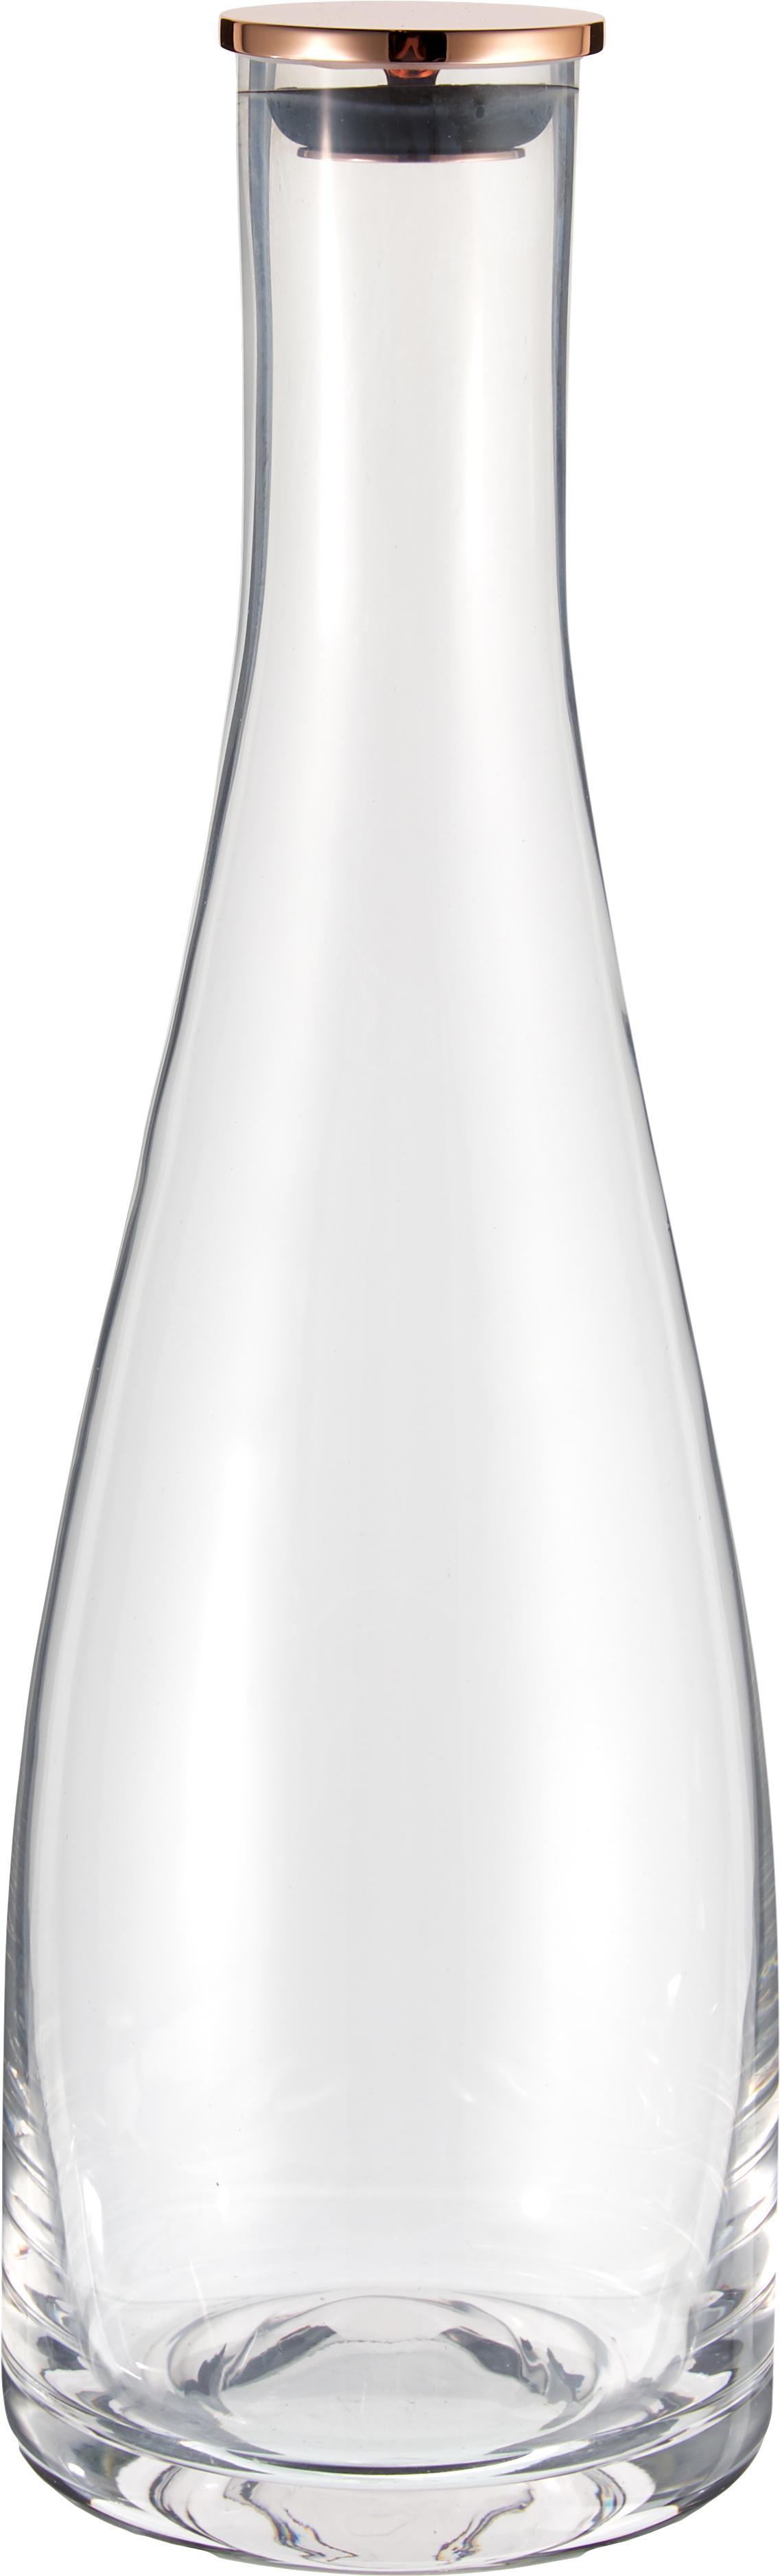 Waterkaraf Flow, Glas, Transparant, 1 l